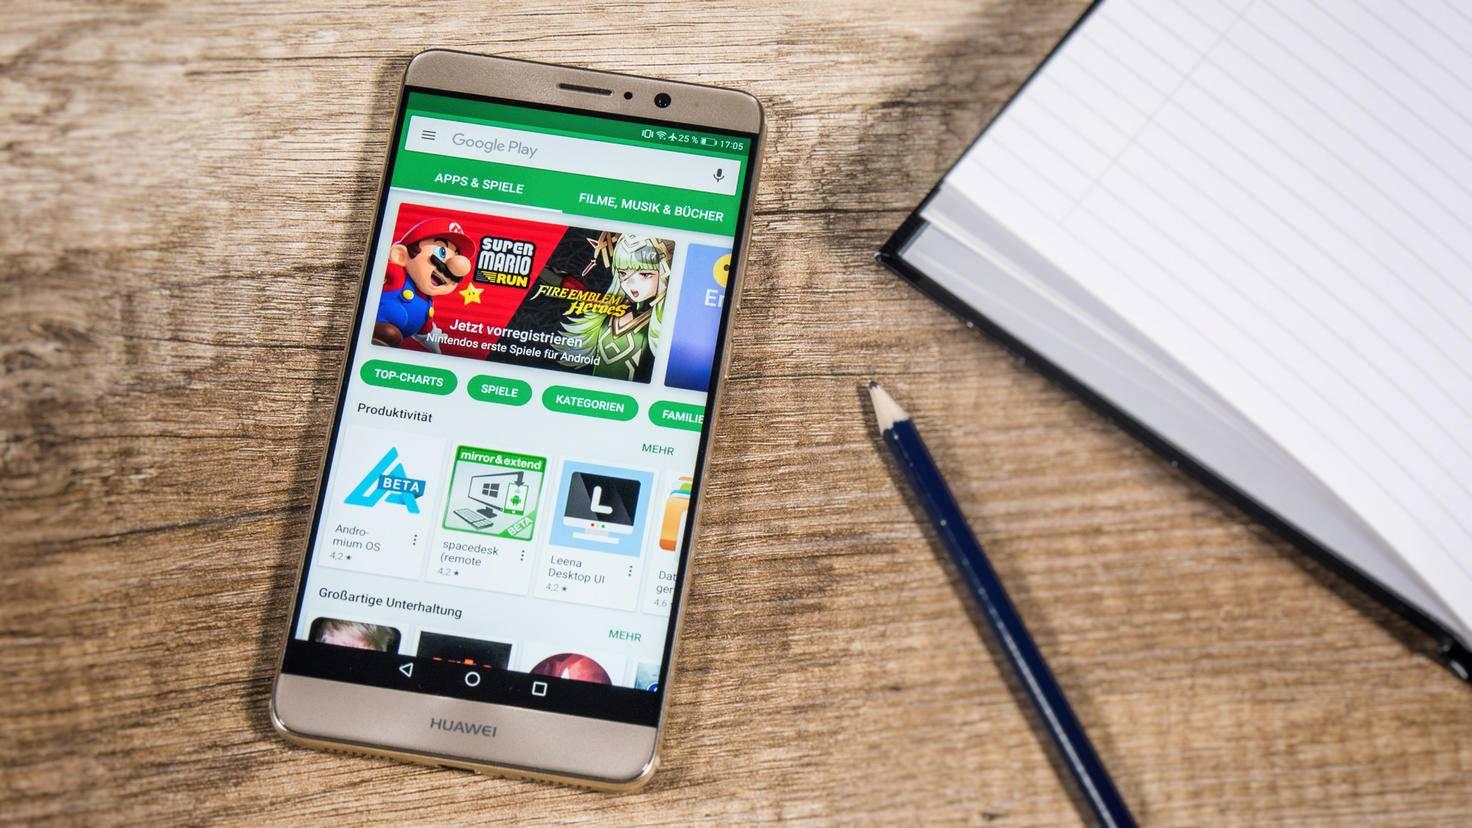 Google Play Store Smartphone